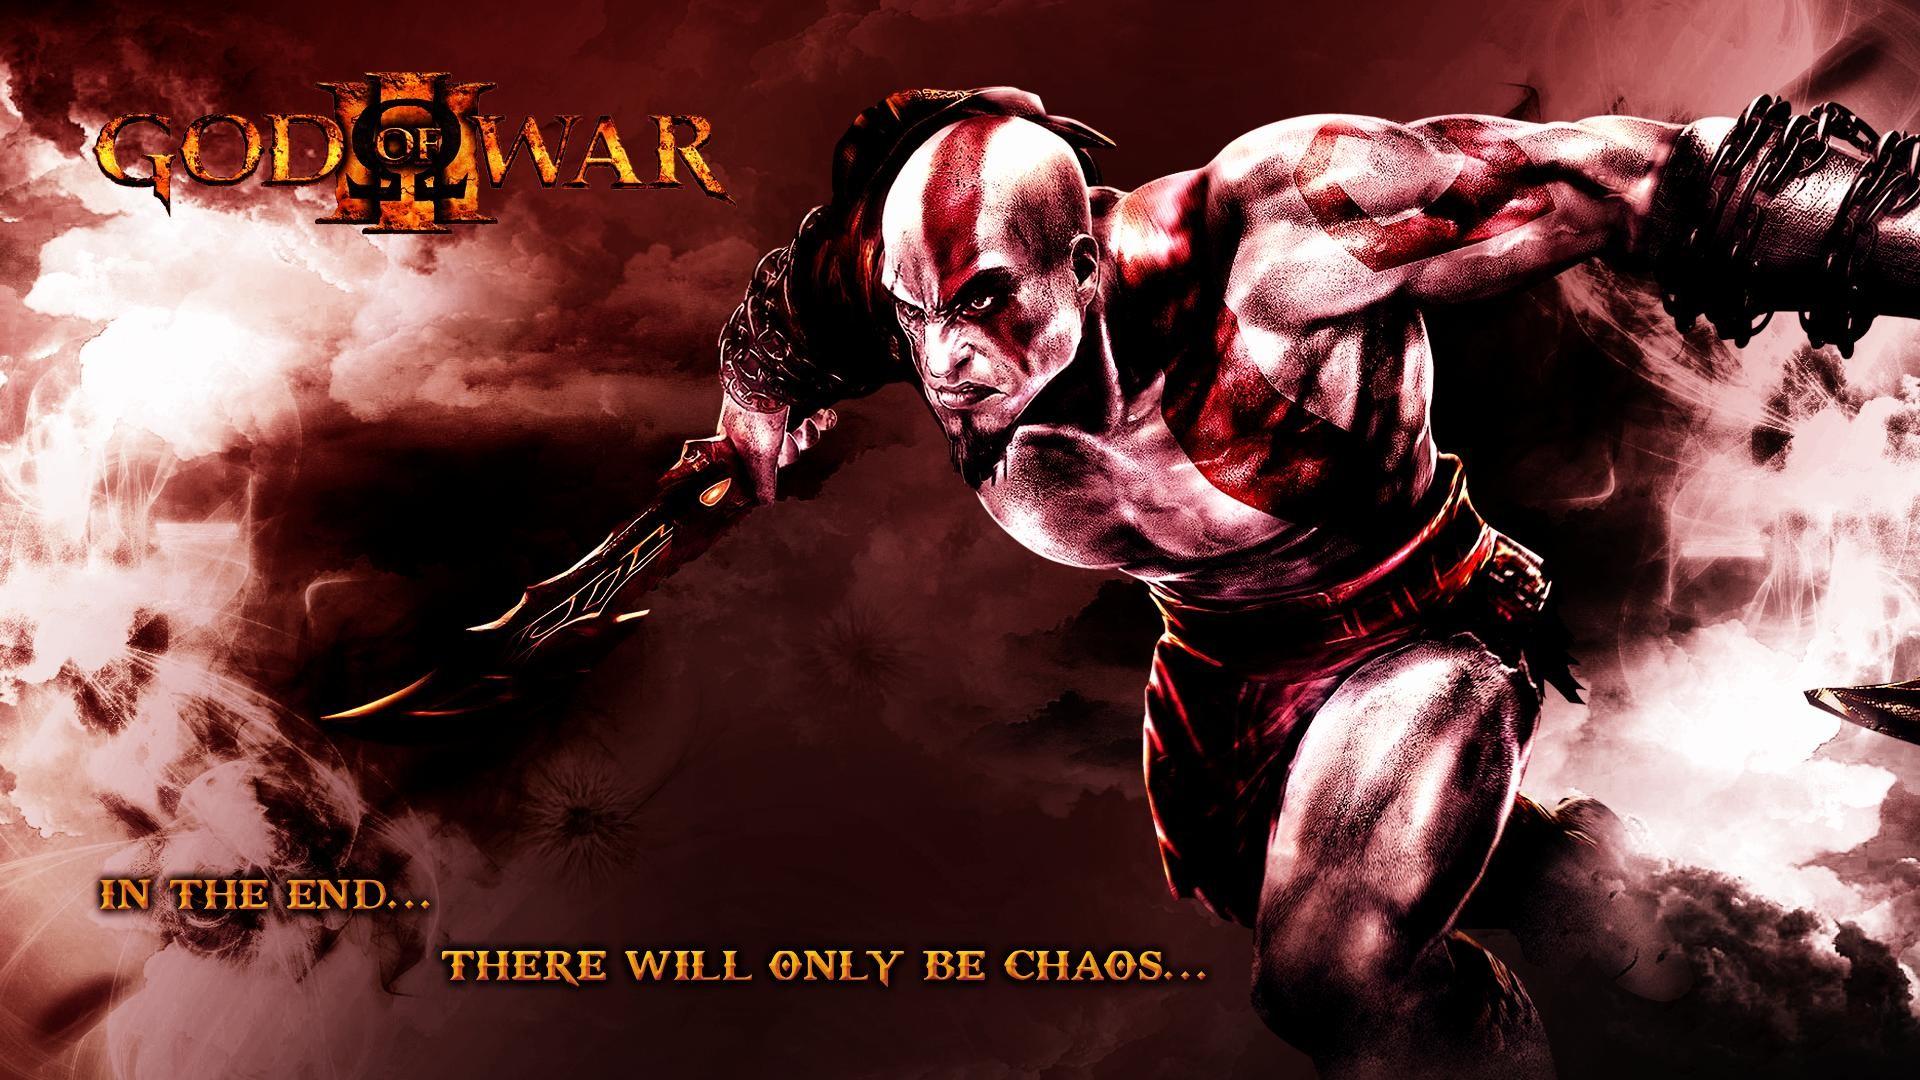 God Of War 3 Kratos Wallpaper For Iphone   Data-src - God Of War Game Quotes - HD Wallpaper